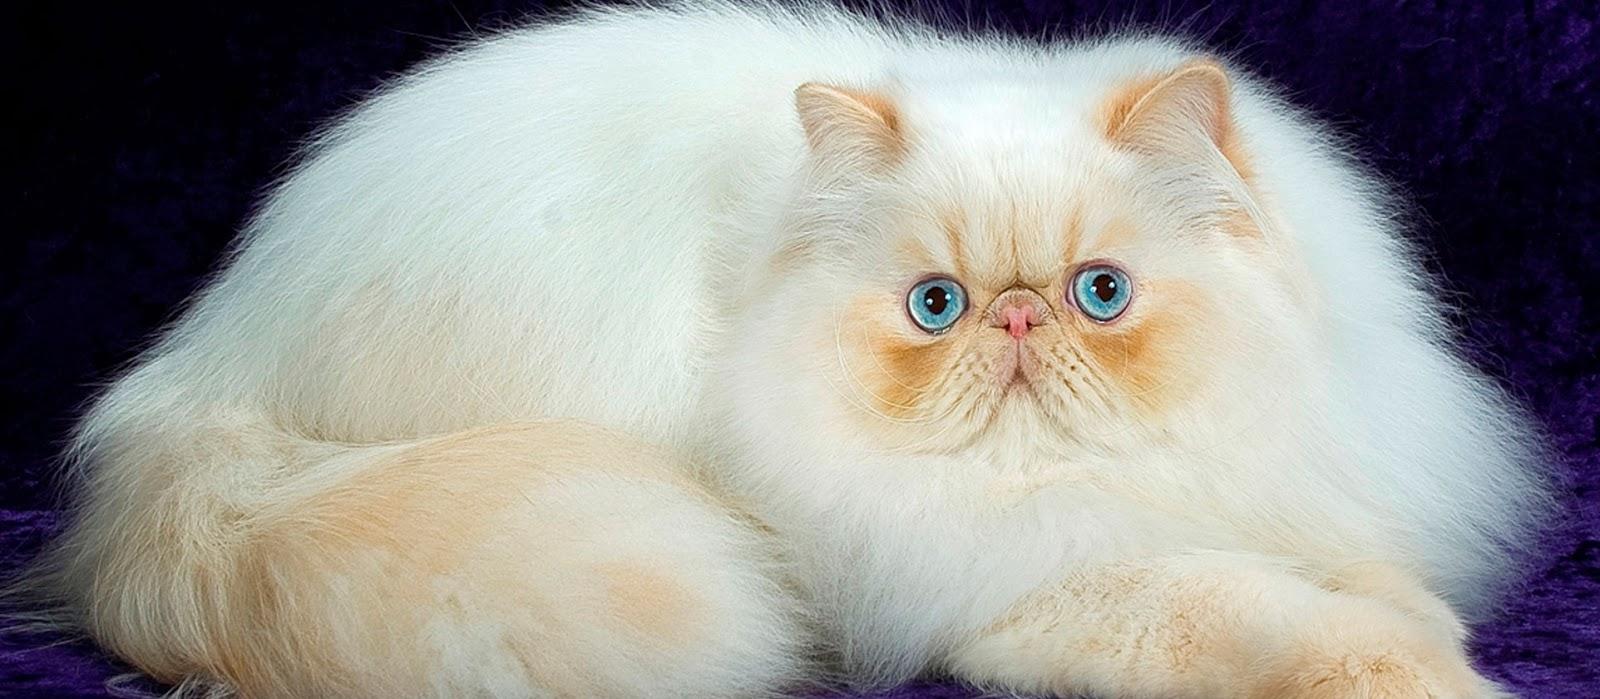 Harga Kucing Persia Dan Kucing Anggora 2019 Terbaru